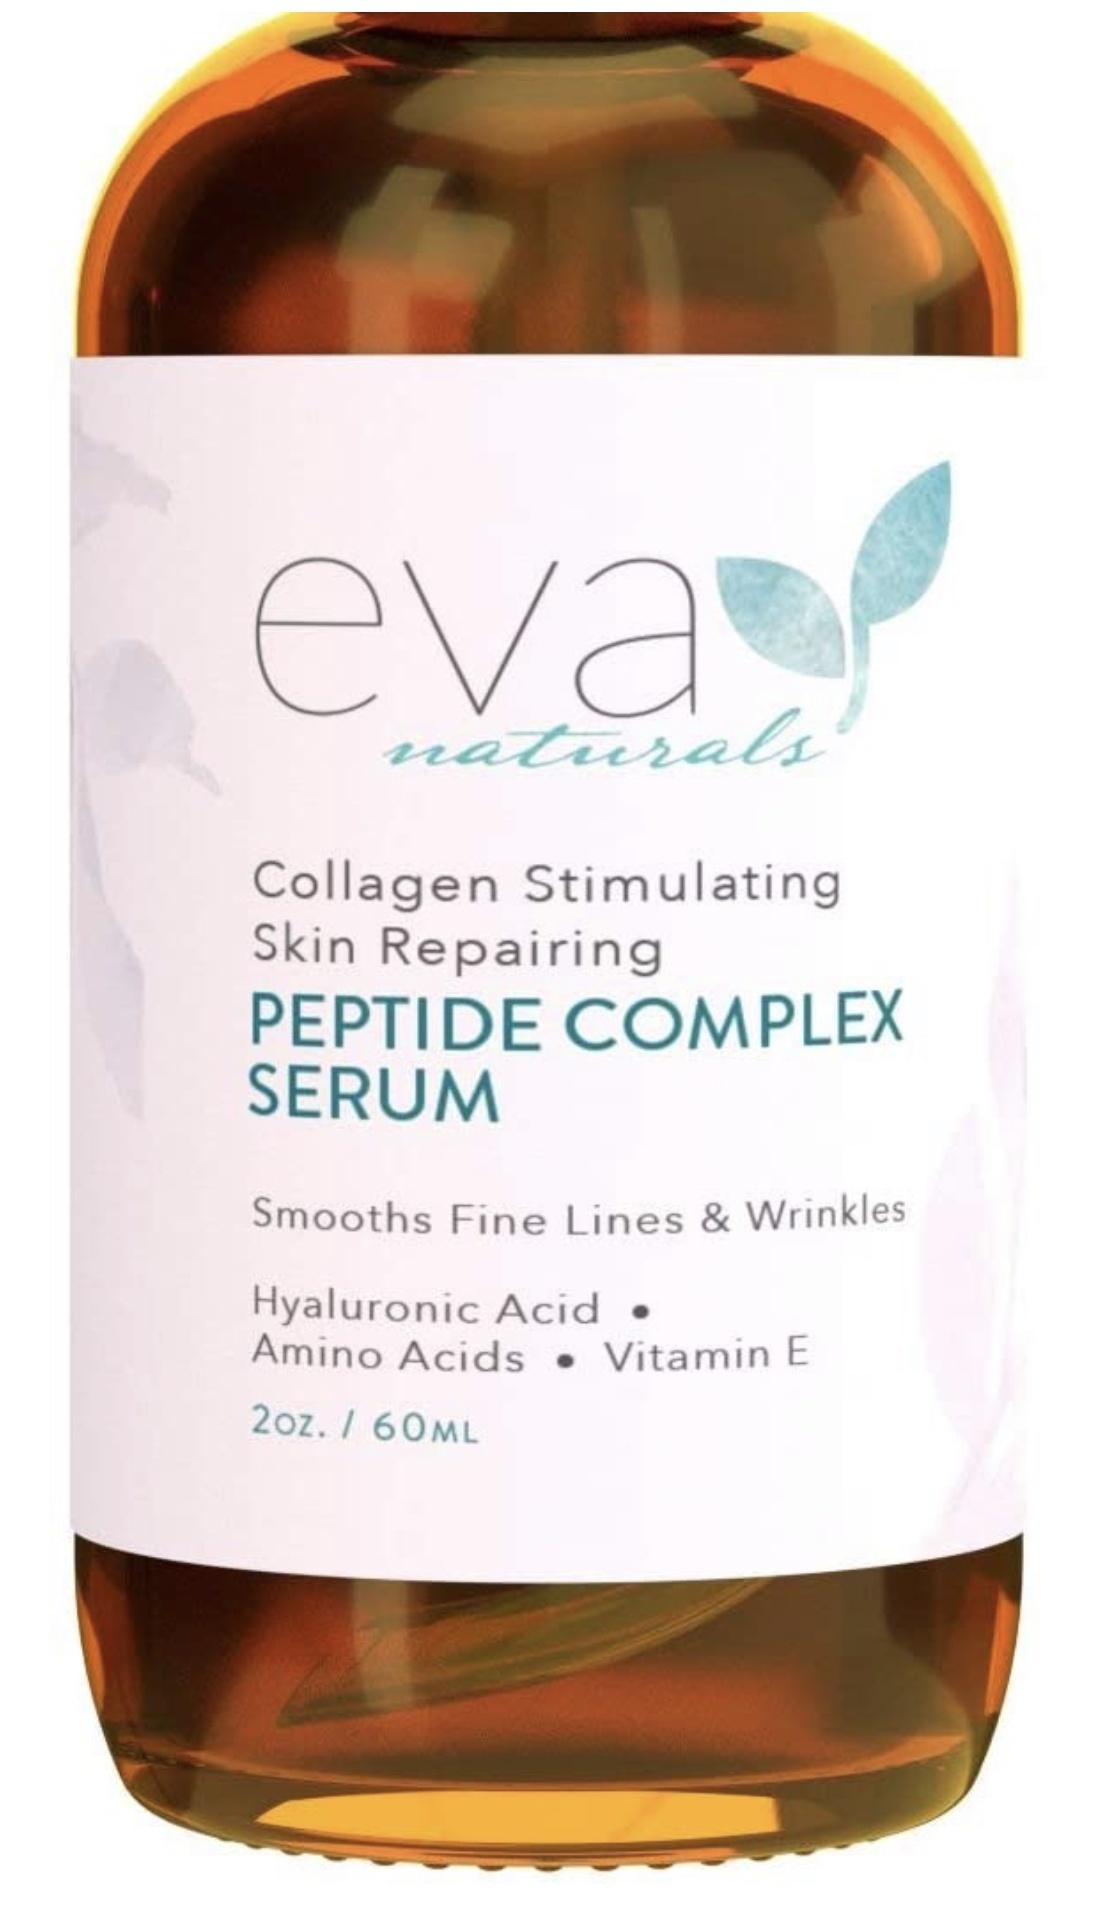 Eva Naturals Peptide Complex Serum